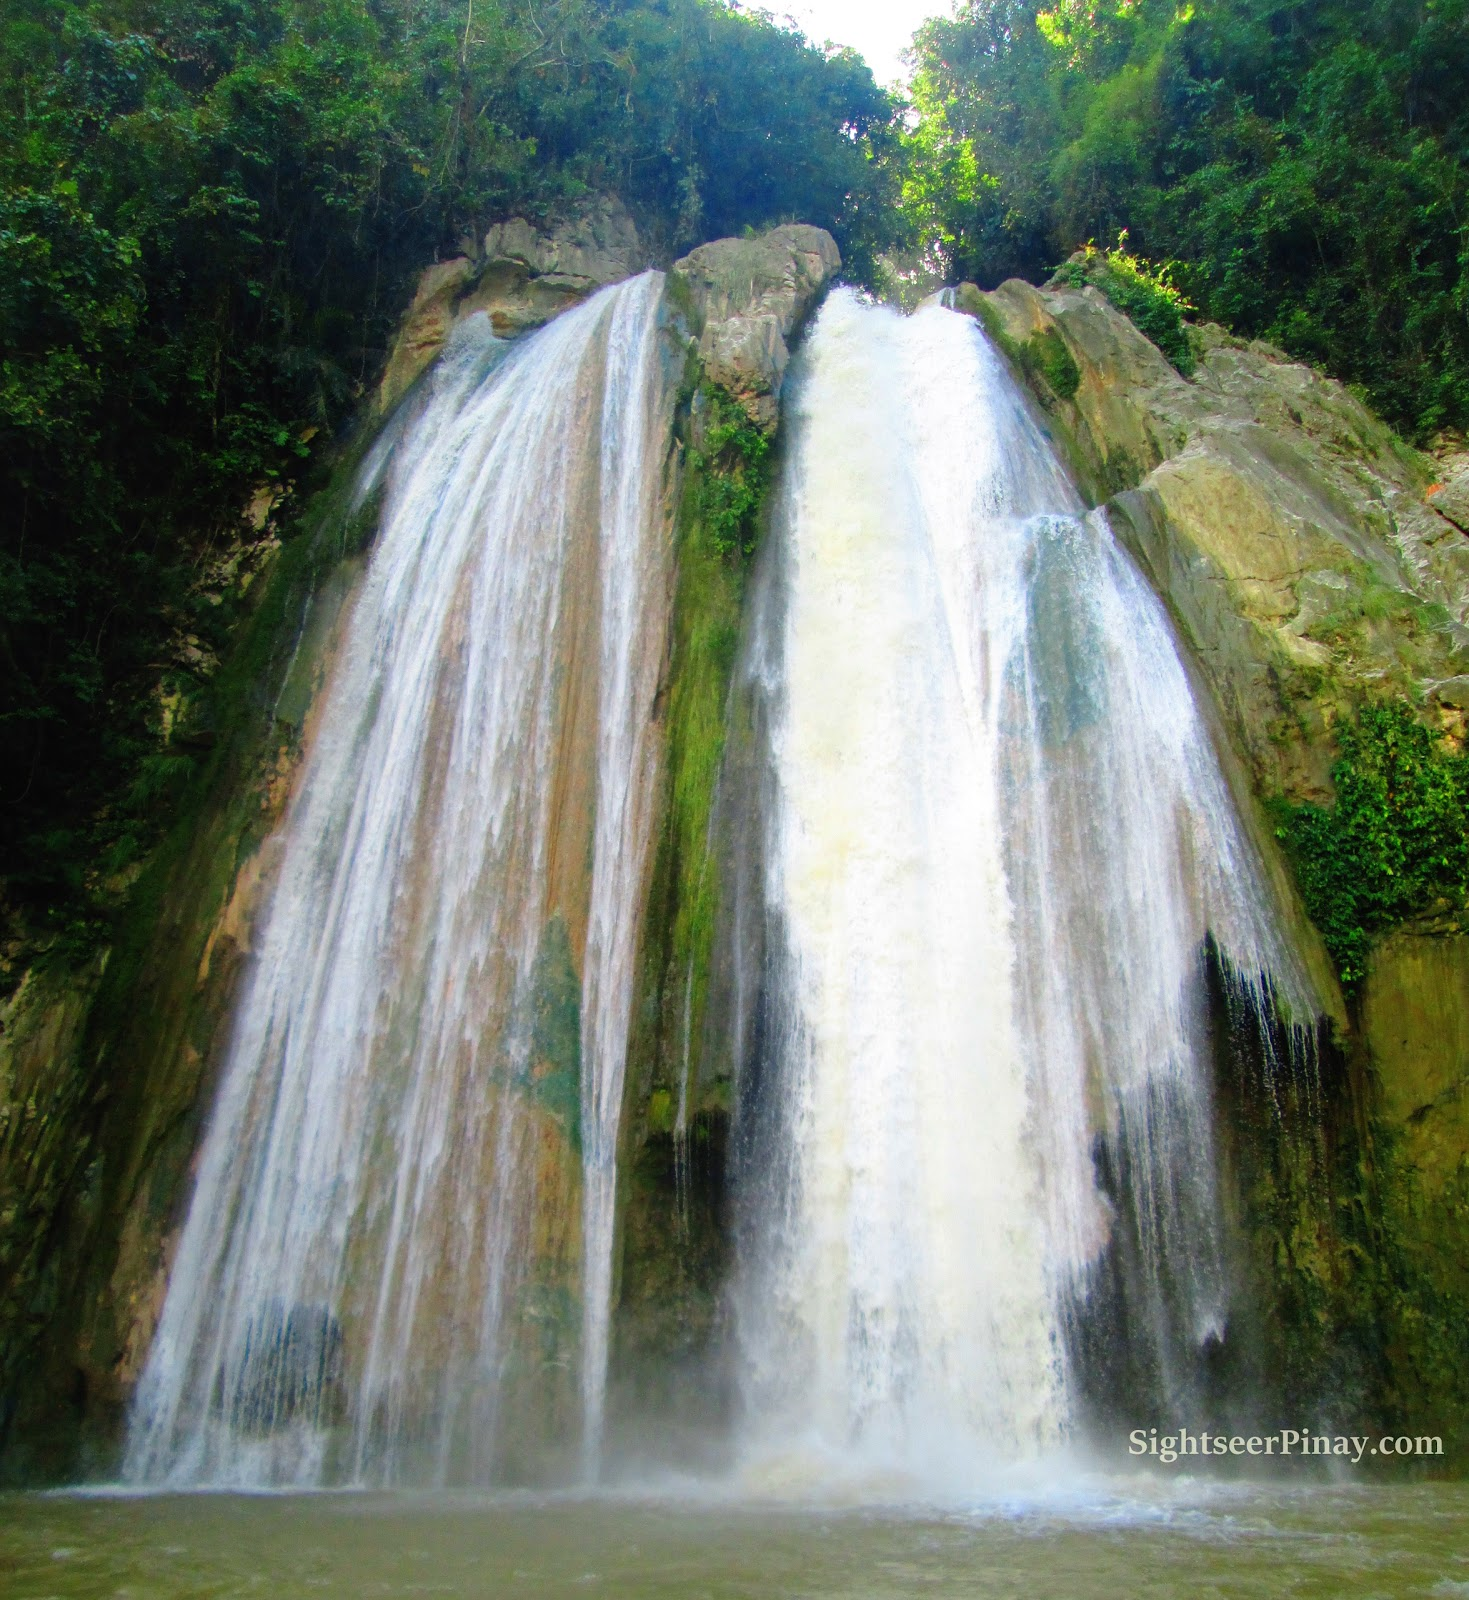 Visiting Dodiongan Falls in Iligan City